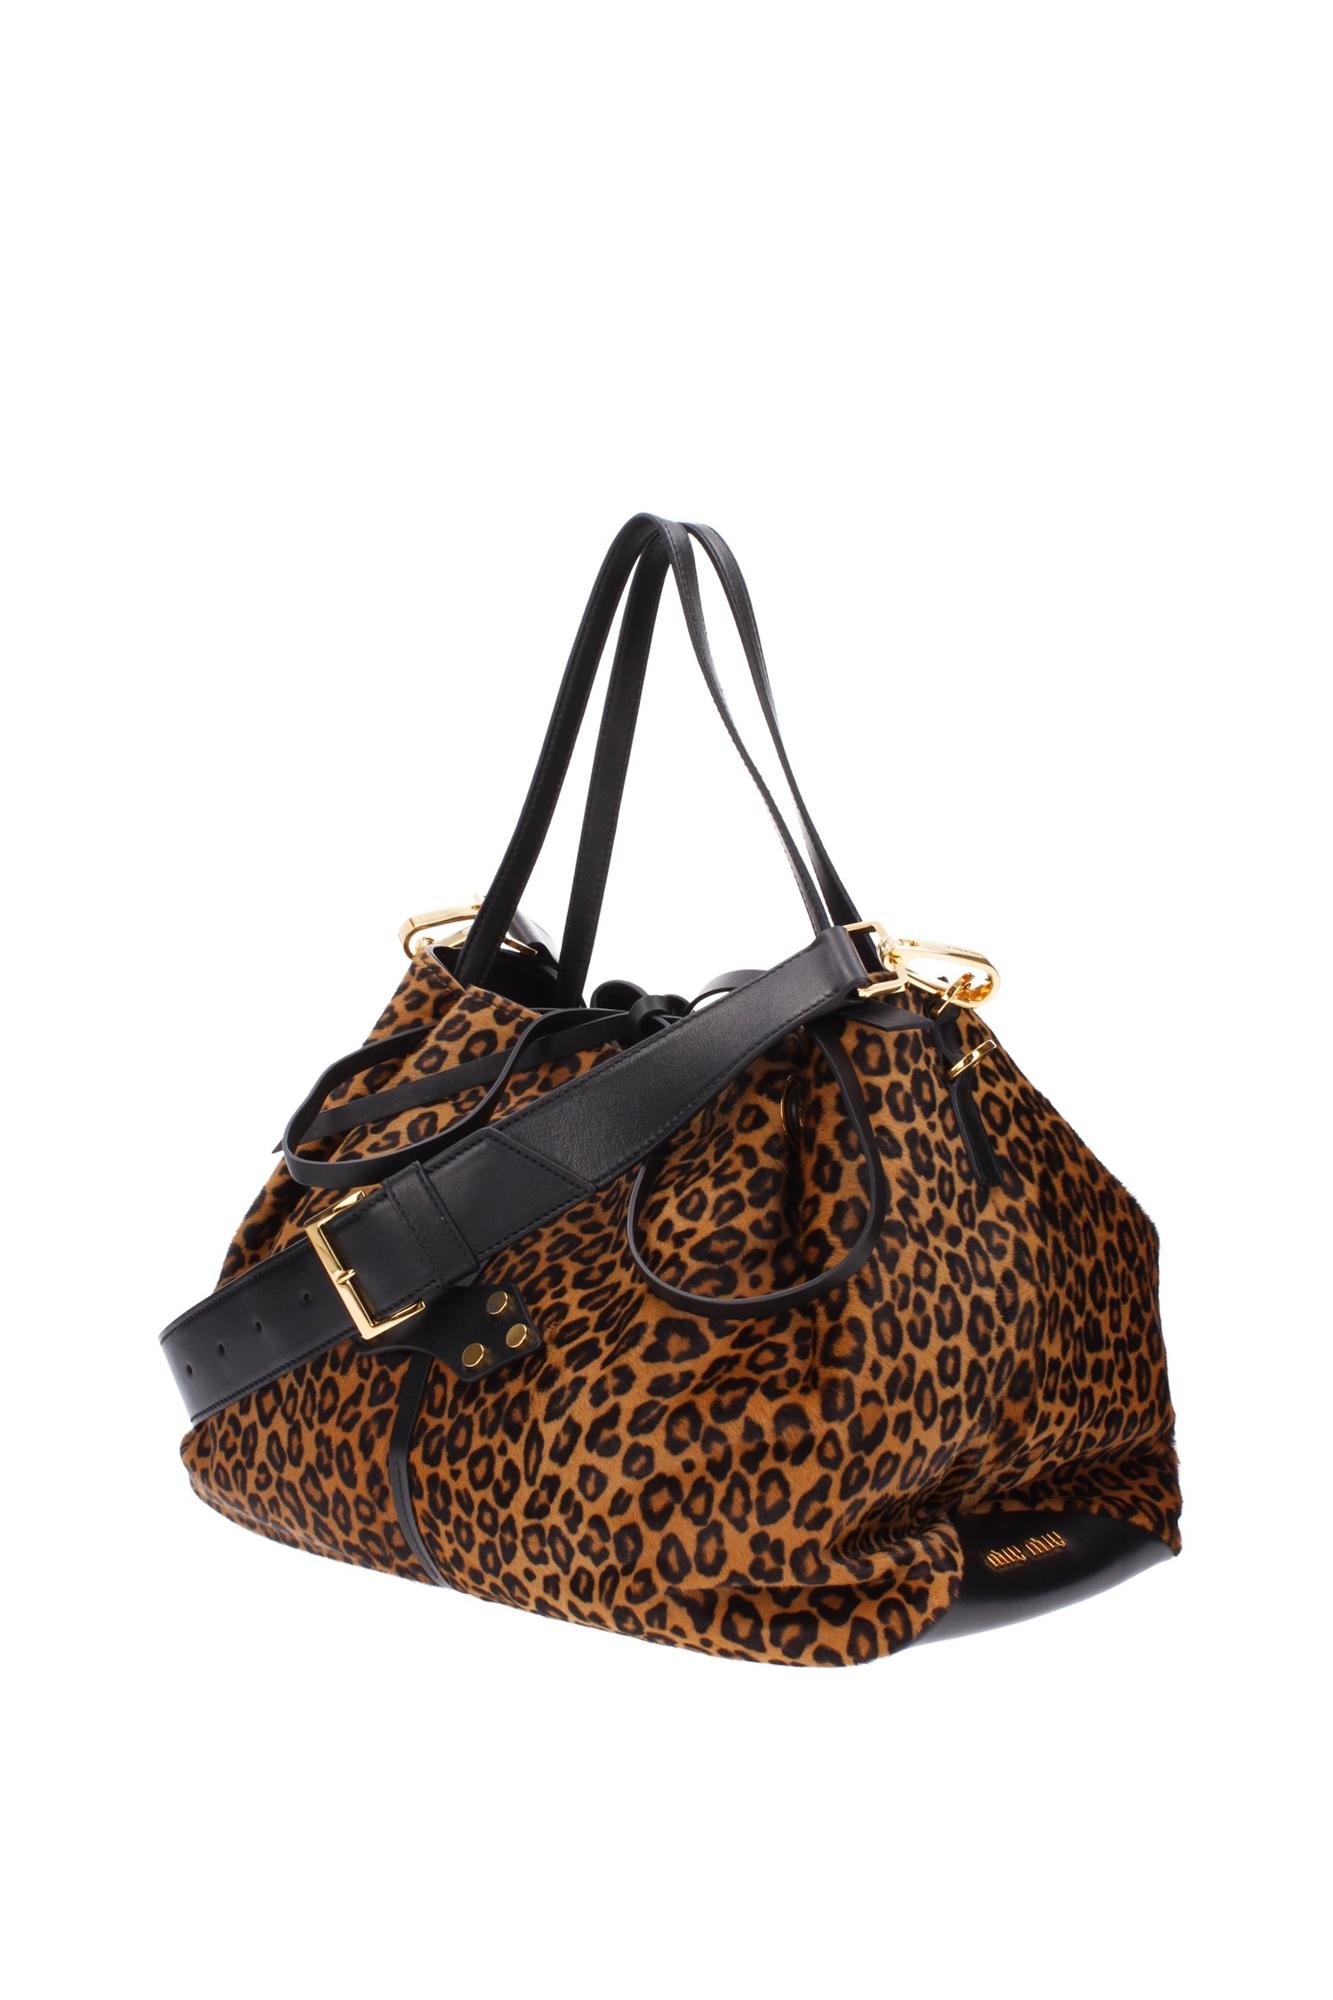 32545bbd9e85 Hand Bags Miu Miu Women Pony Skin Brown RR1918MIELEMORO